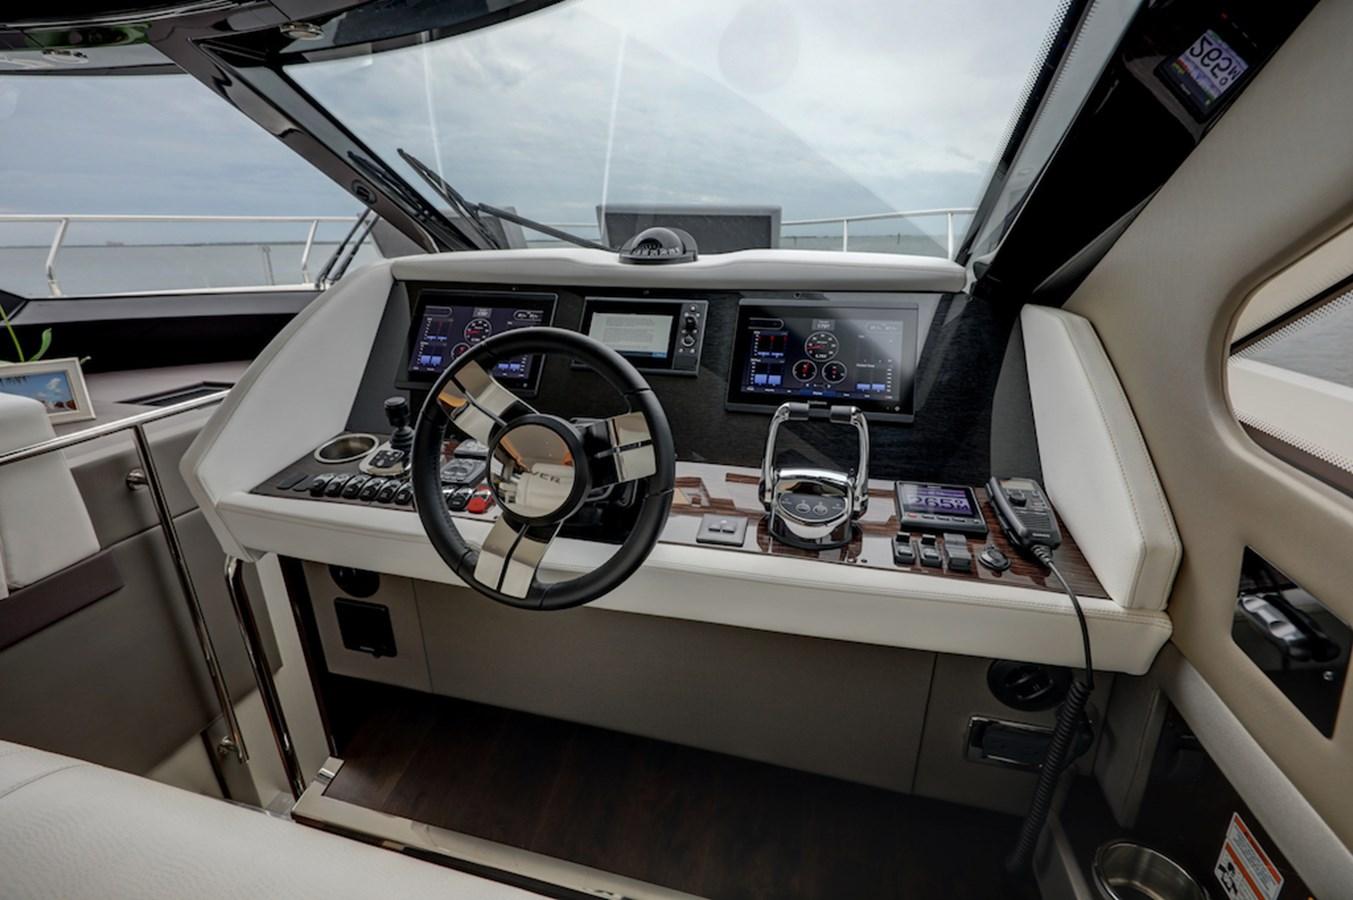 B44A7894_5_6_7_8 - Copy 2020 CARVER  Motor Yacht 2824996